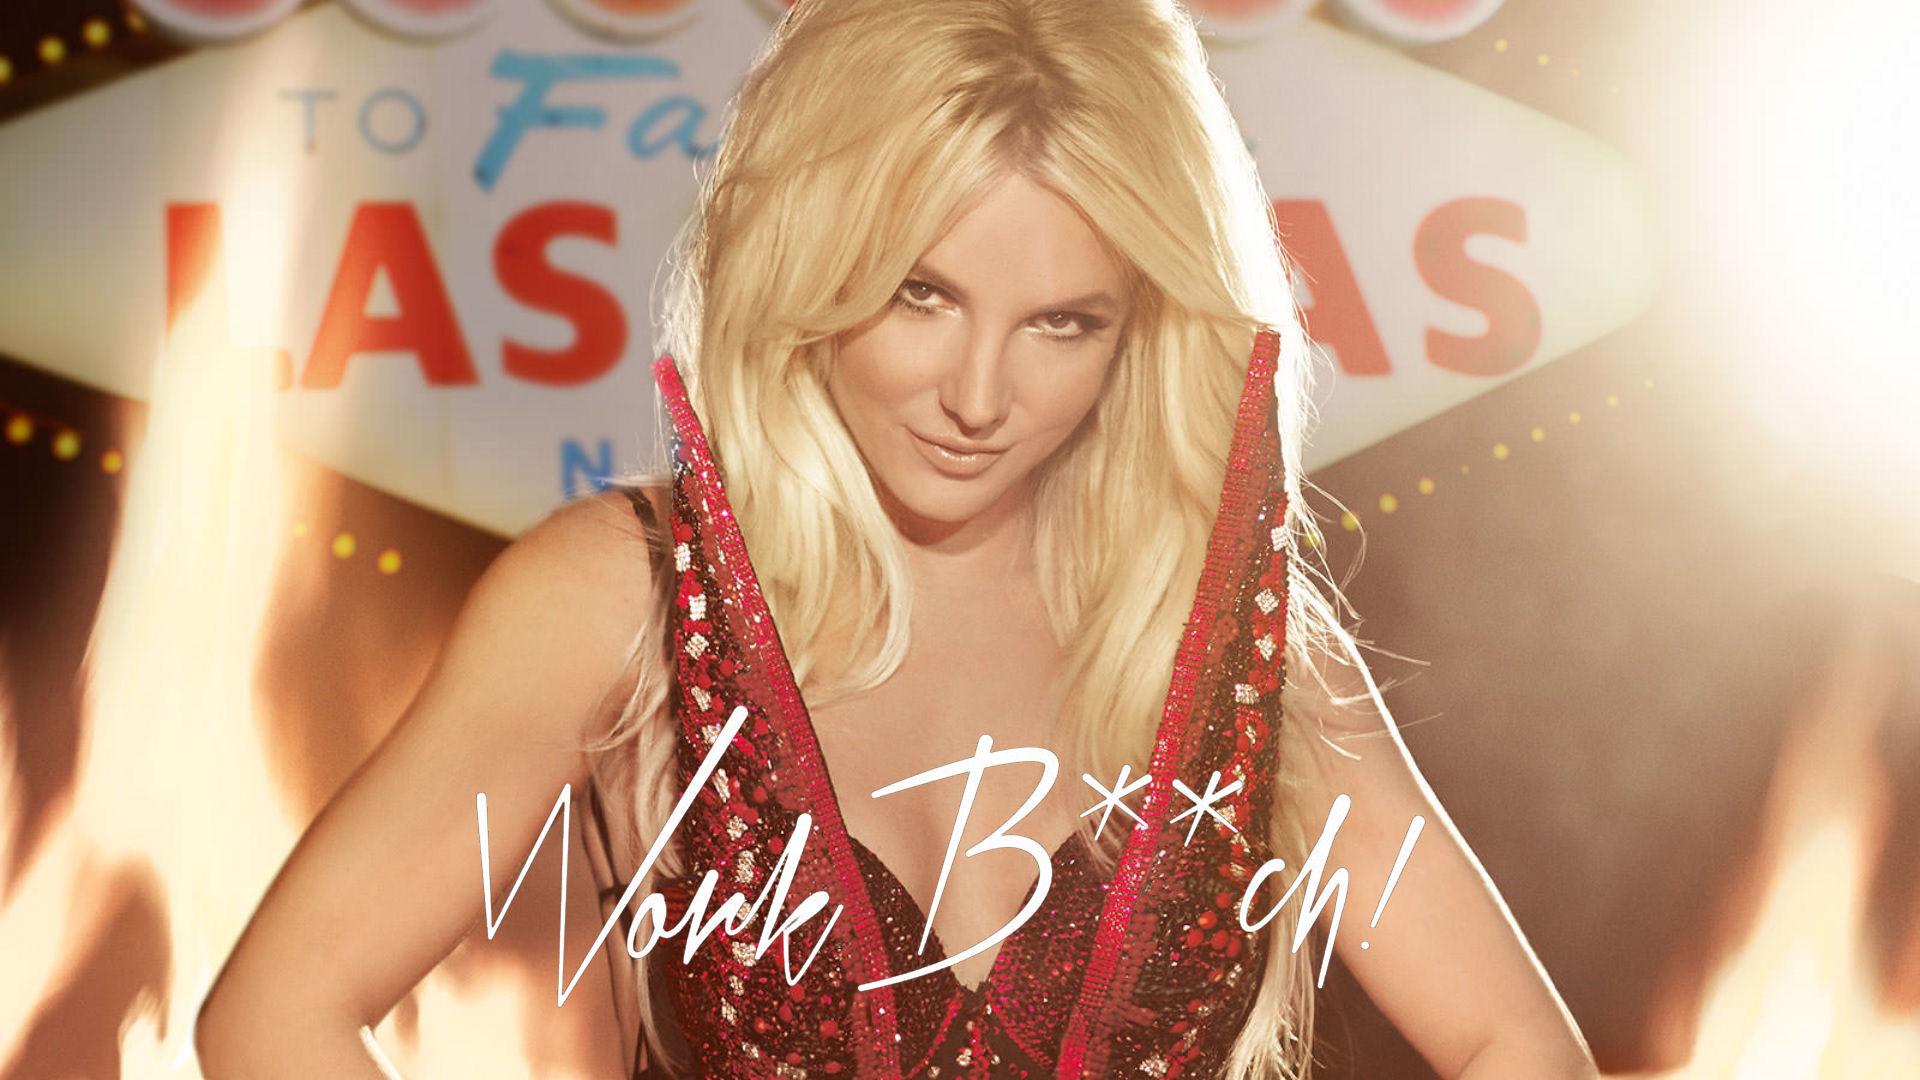 Britney Spears Work B**ch ! Las Vegas - Britney Spears ... Britney Spears Vegas